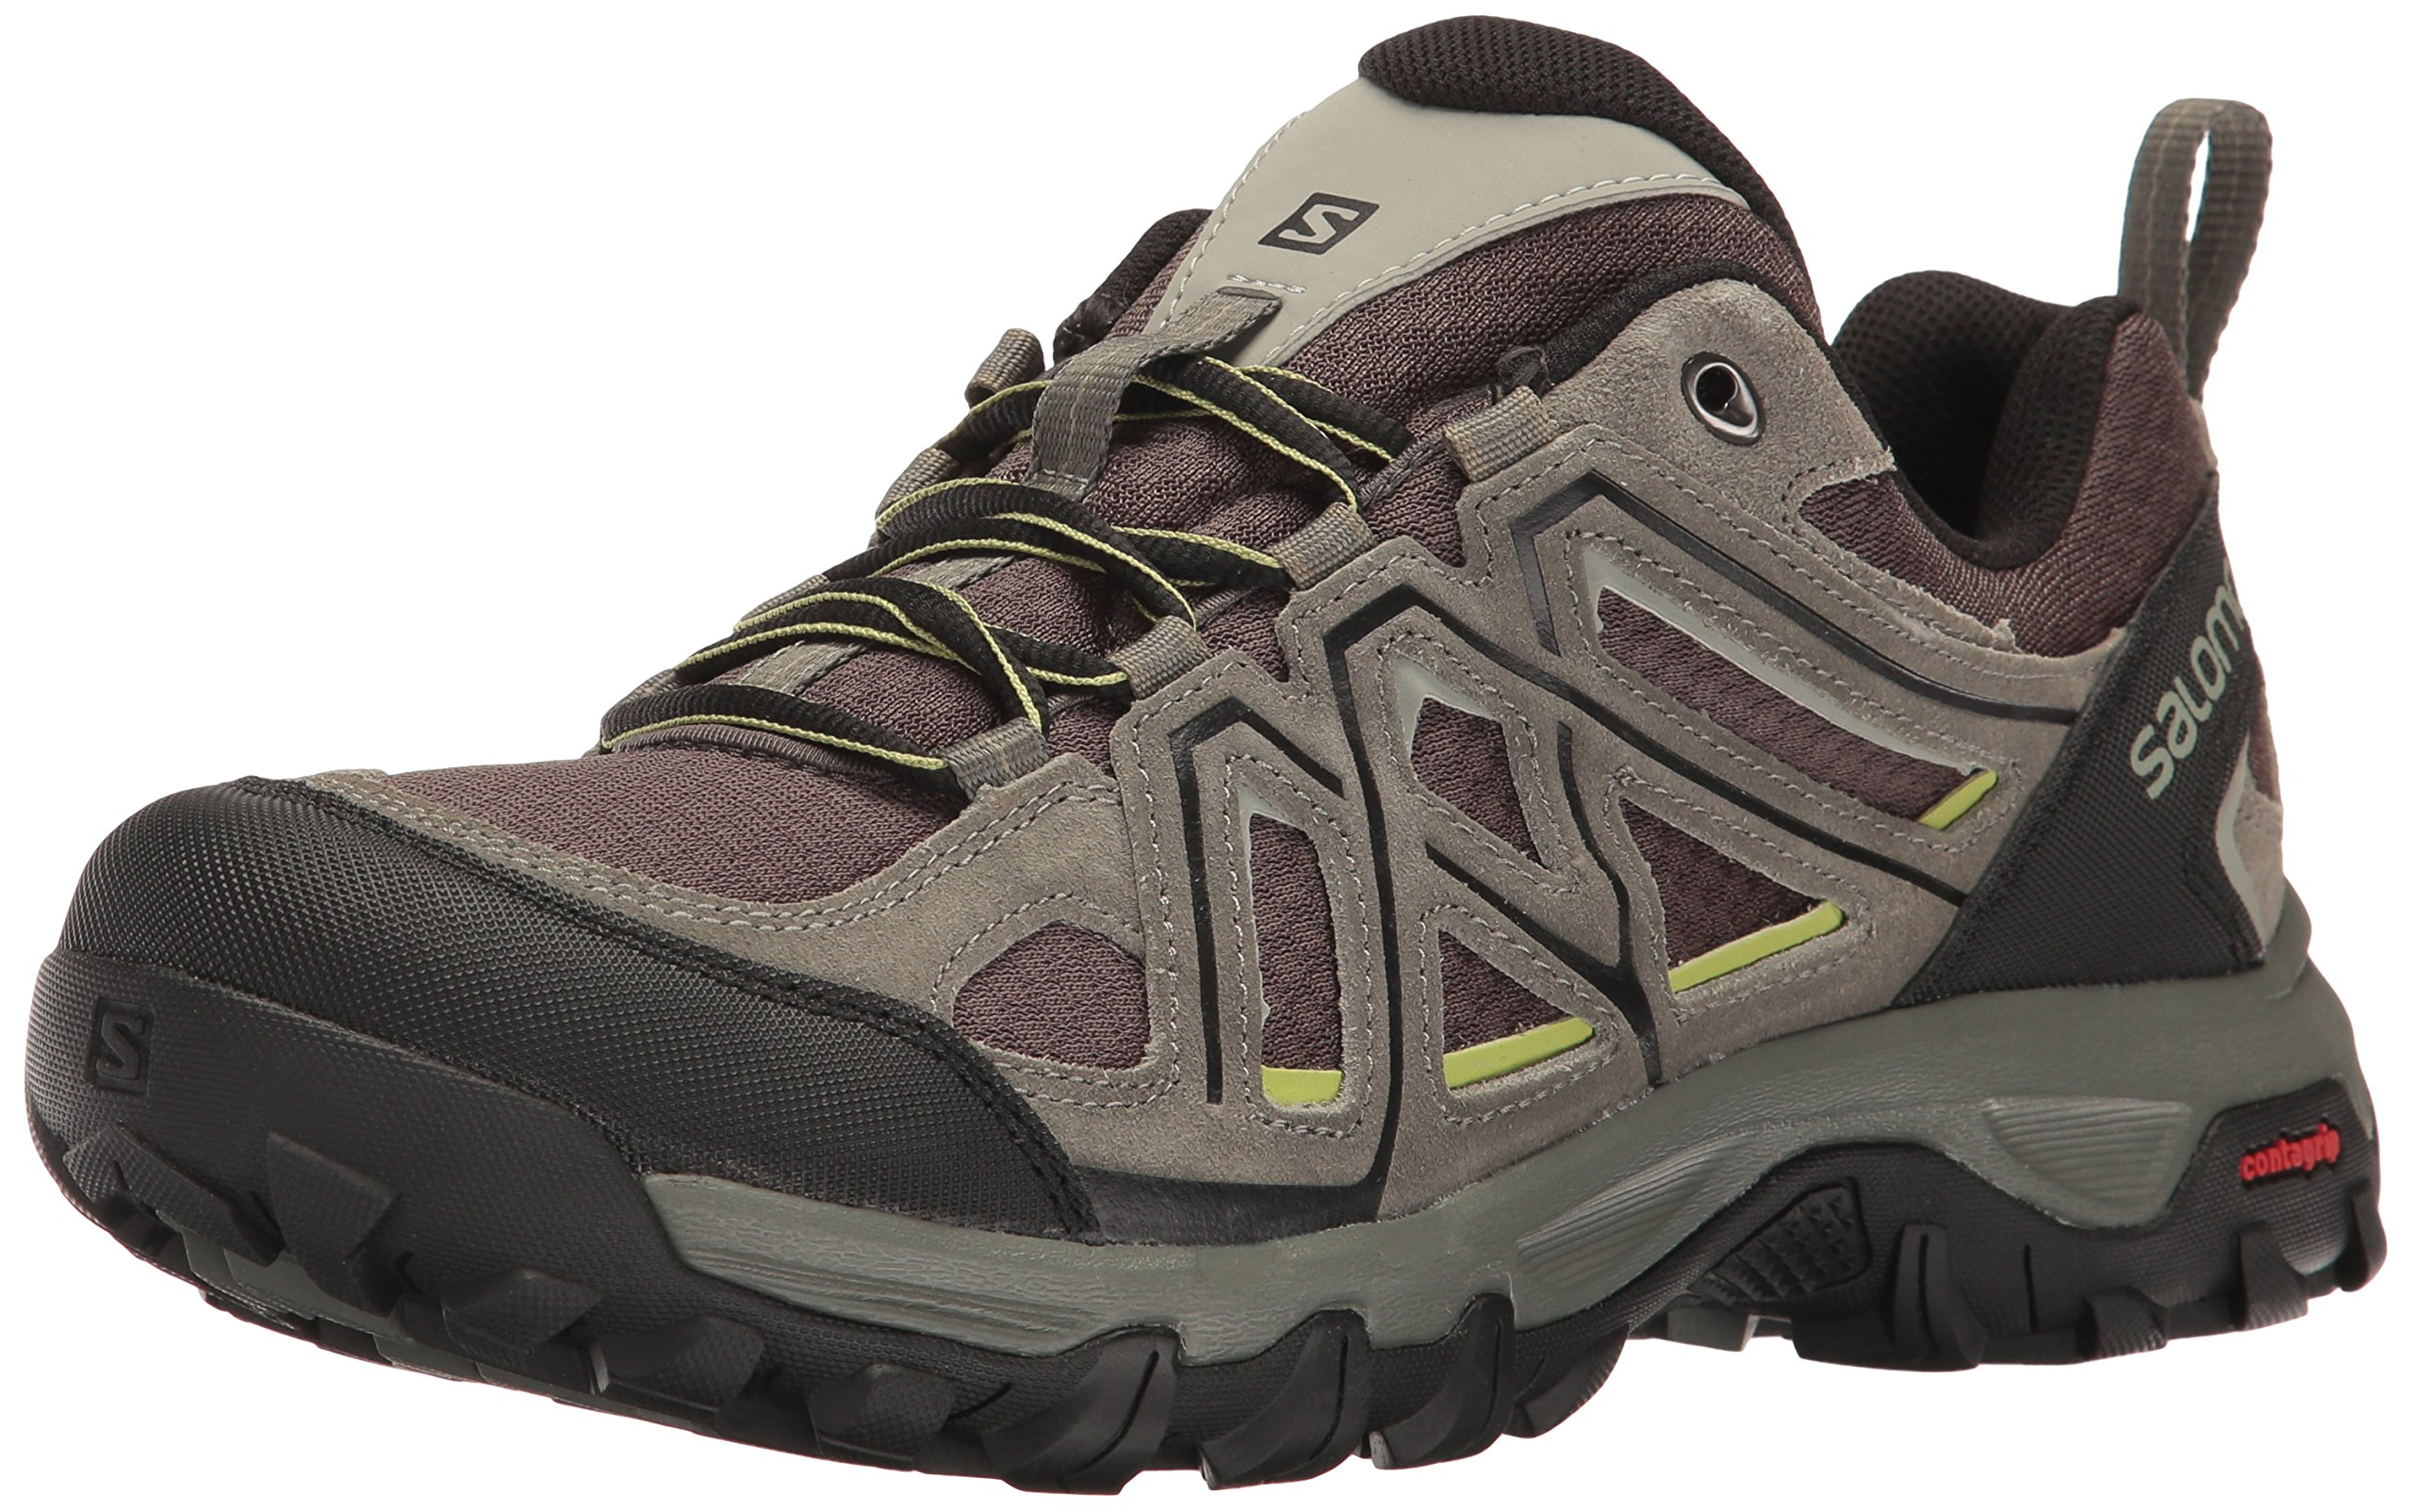 8cc31dc00 Salomon Men's Evasion 2 AERO Hiking Shoe, Castor Gray, 8.5 M US